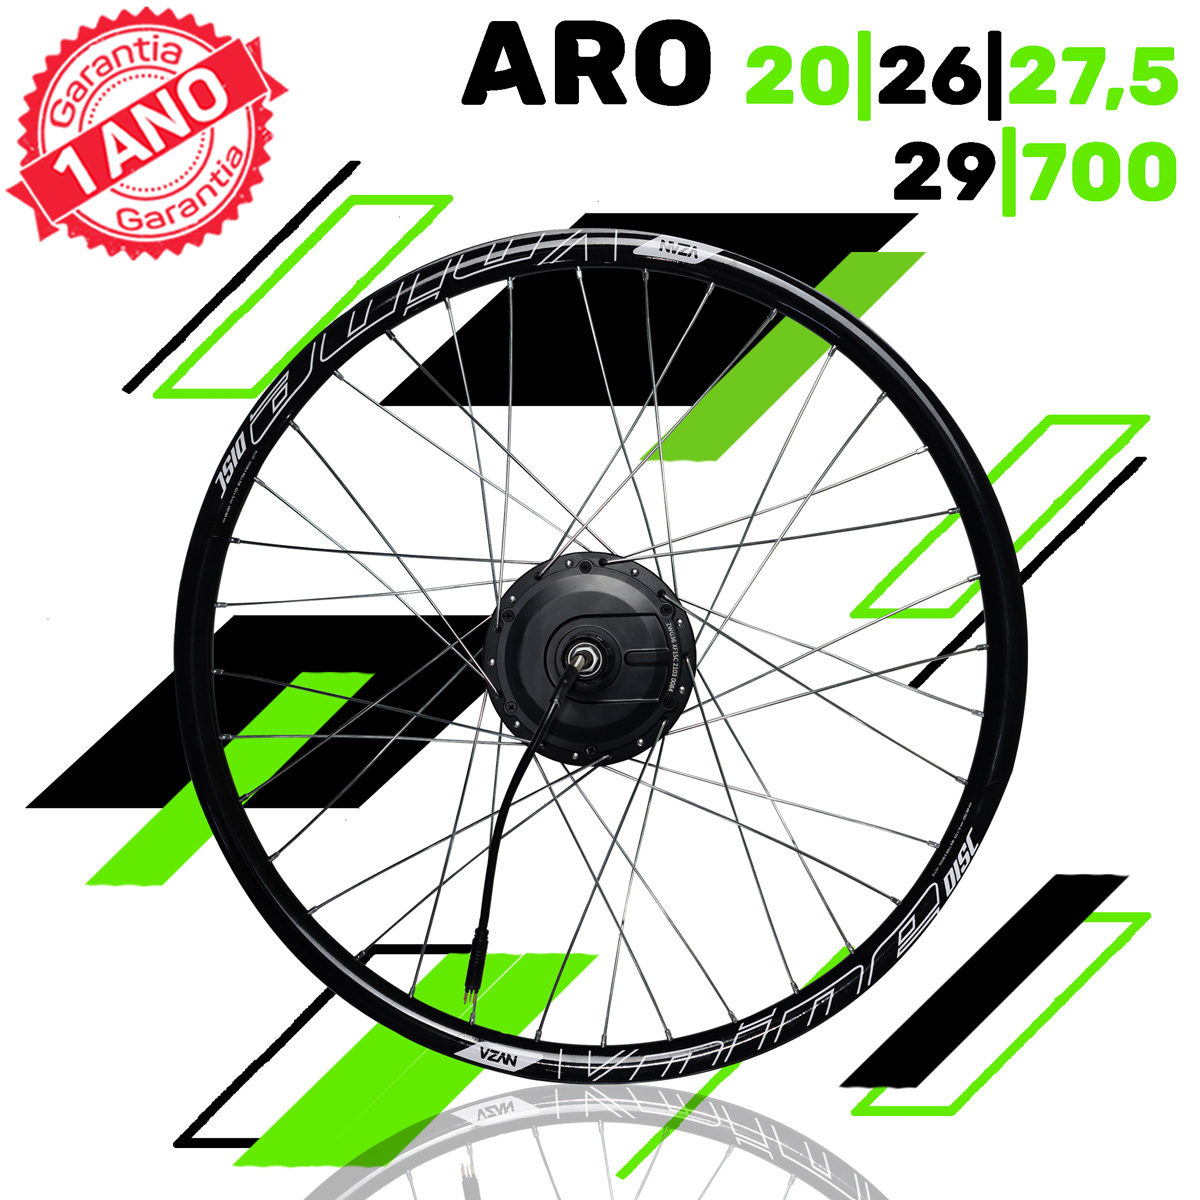 Kit Elétrico para Bicicleta - TecBike - 500 Watts 36V - Aro 700